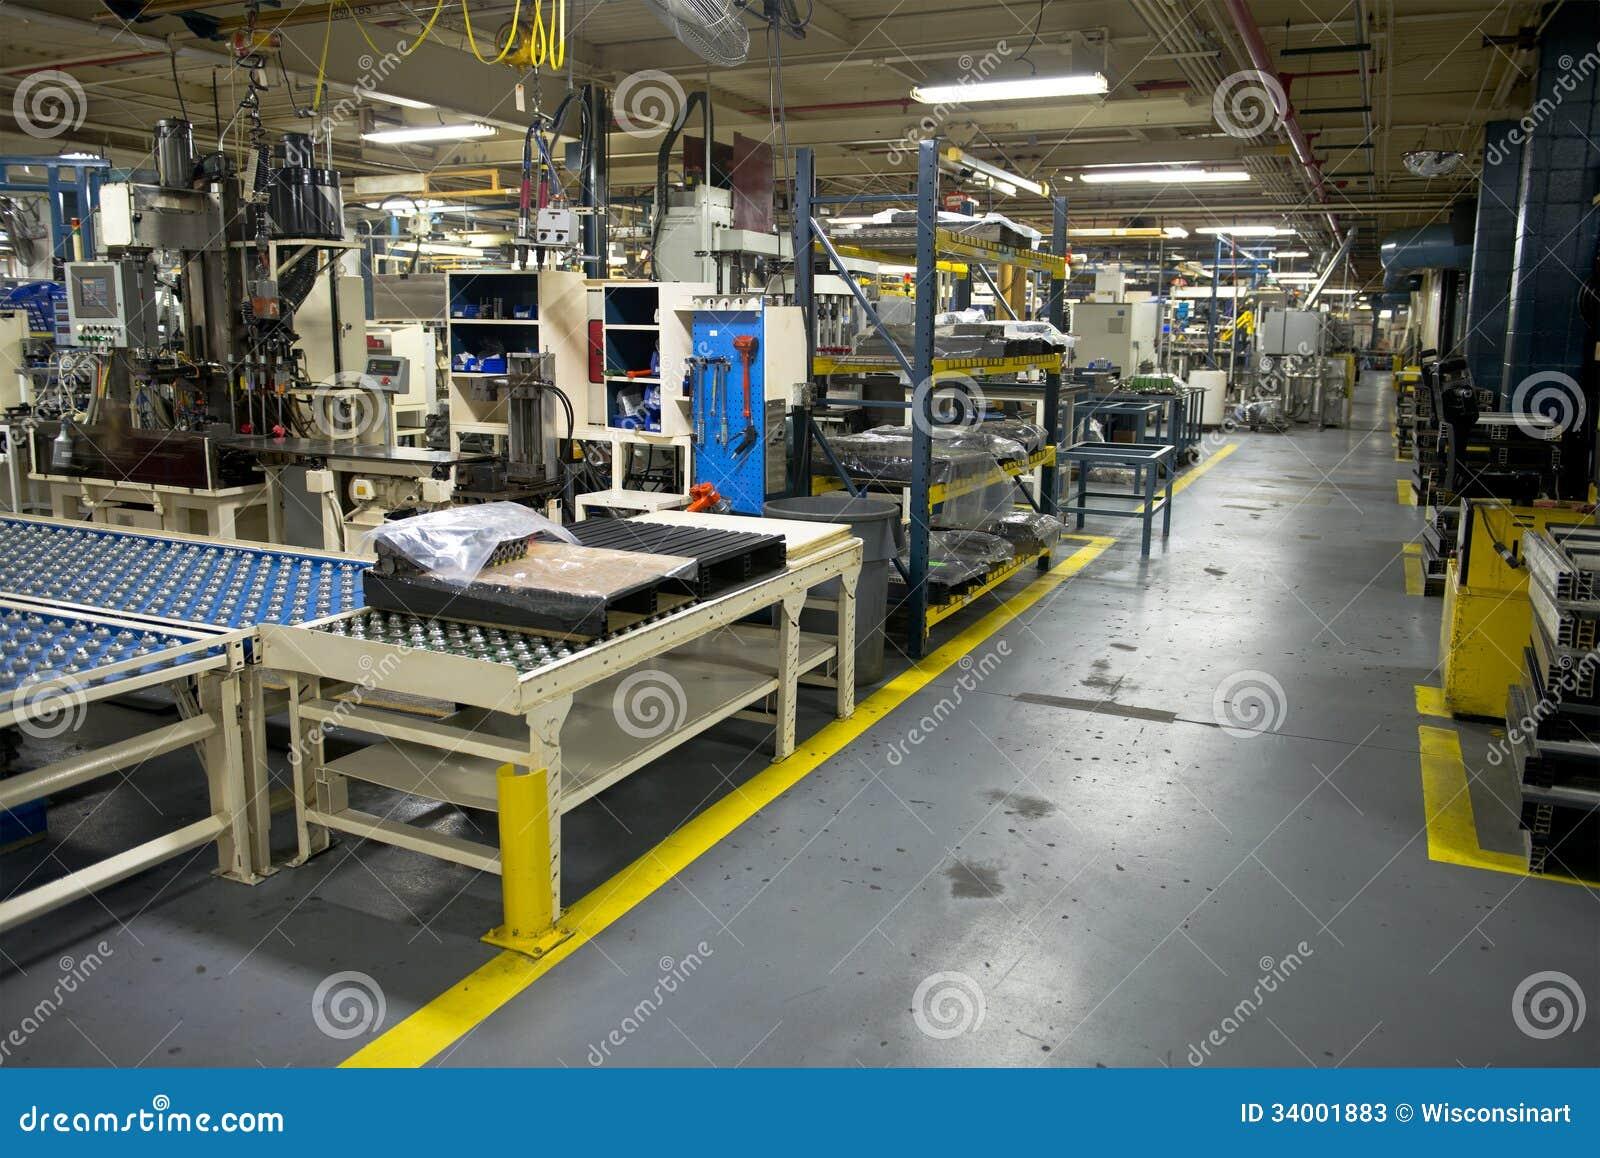 Lieu de travail industriel d usine de fabrication